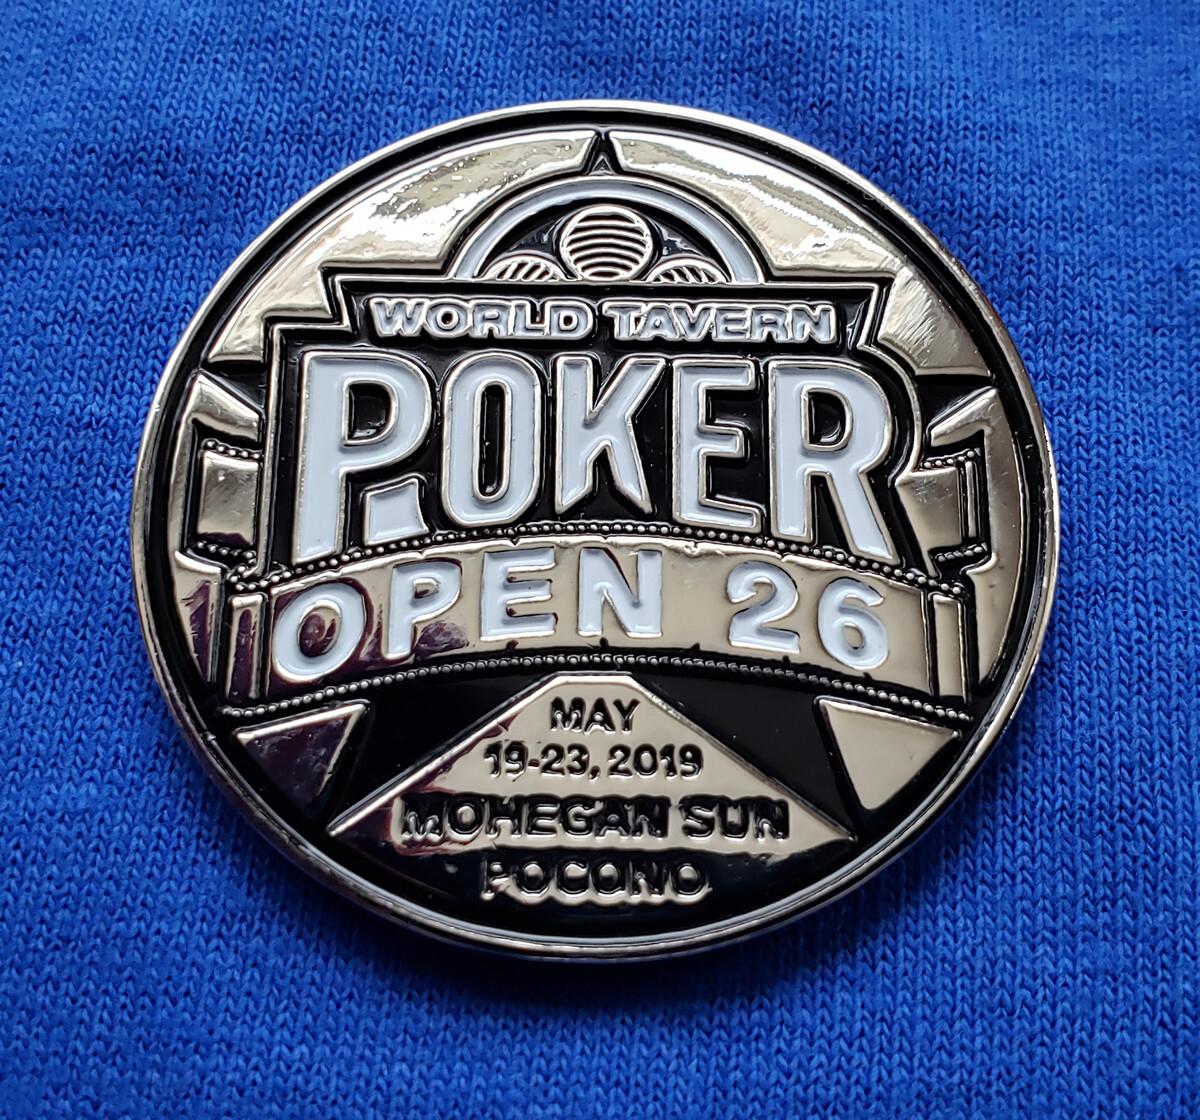 OPEN 26 Medallion